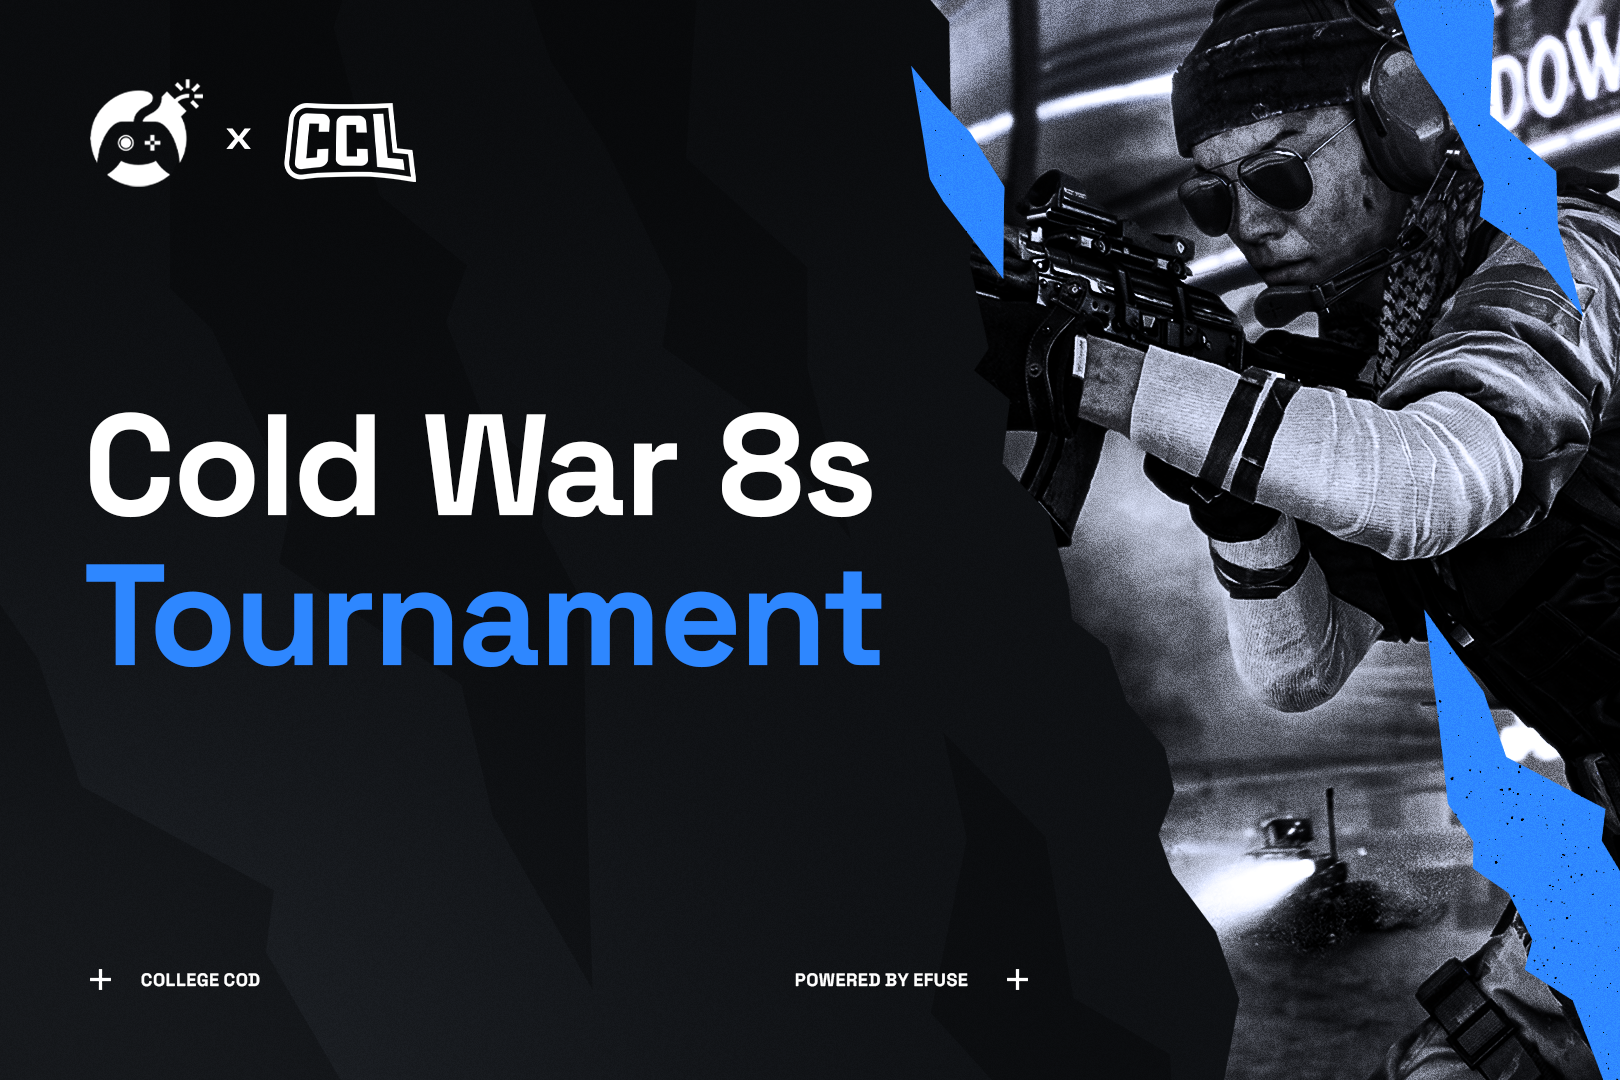 8's tournament